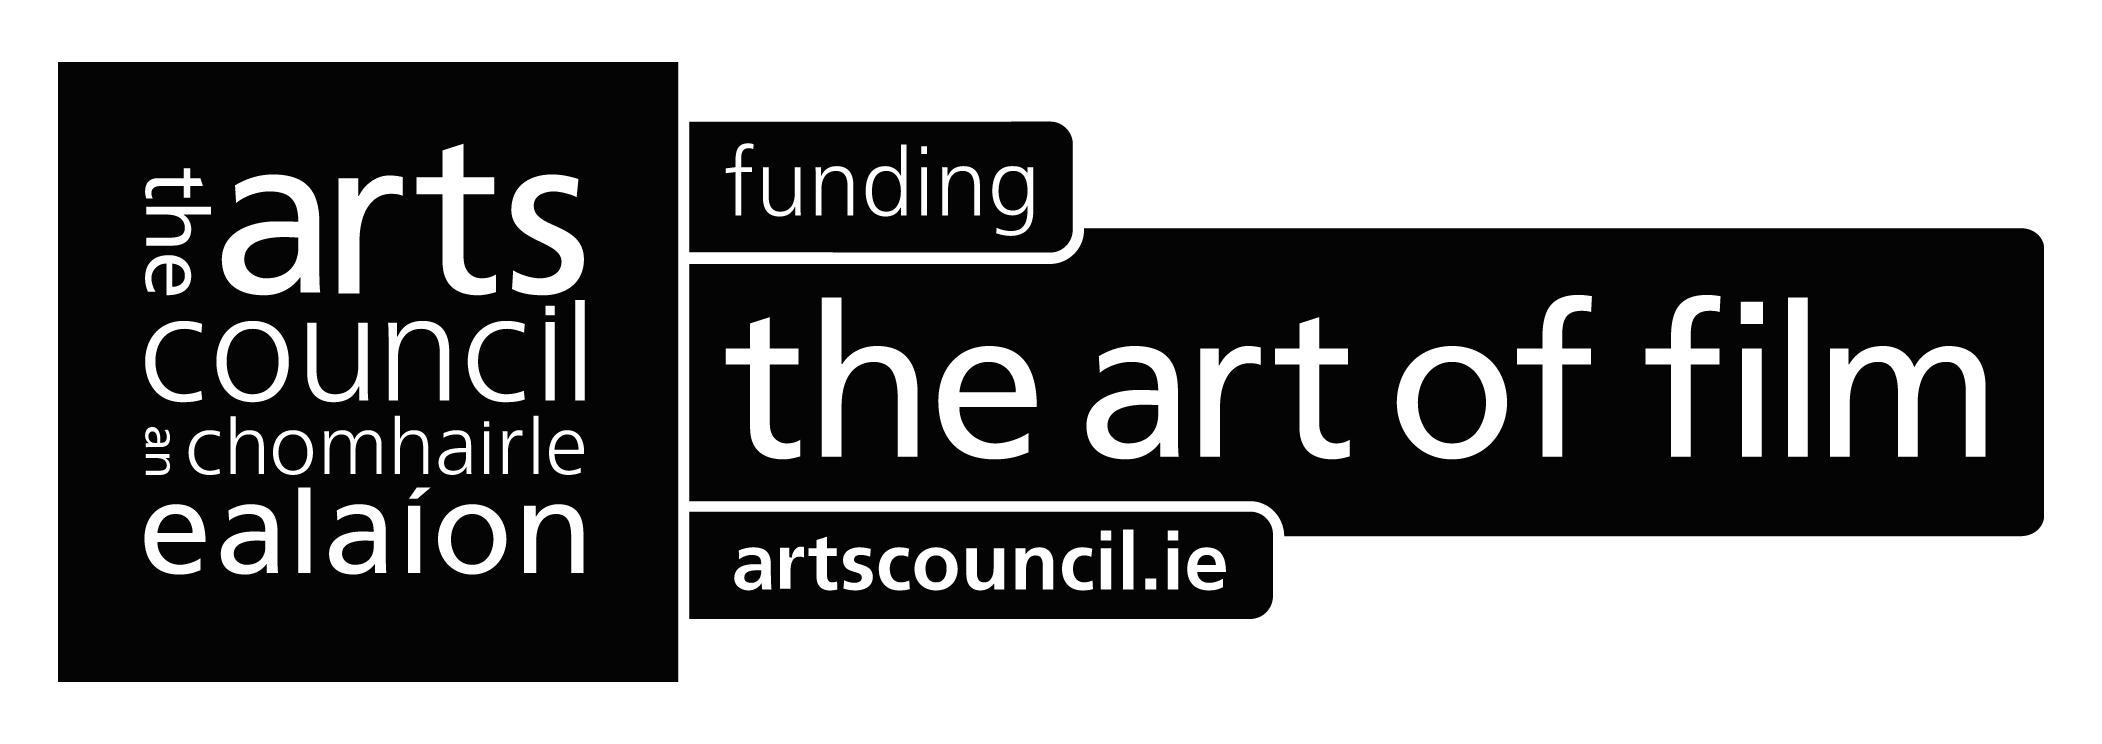 3 Arts Council Logo.jpeg